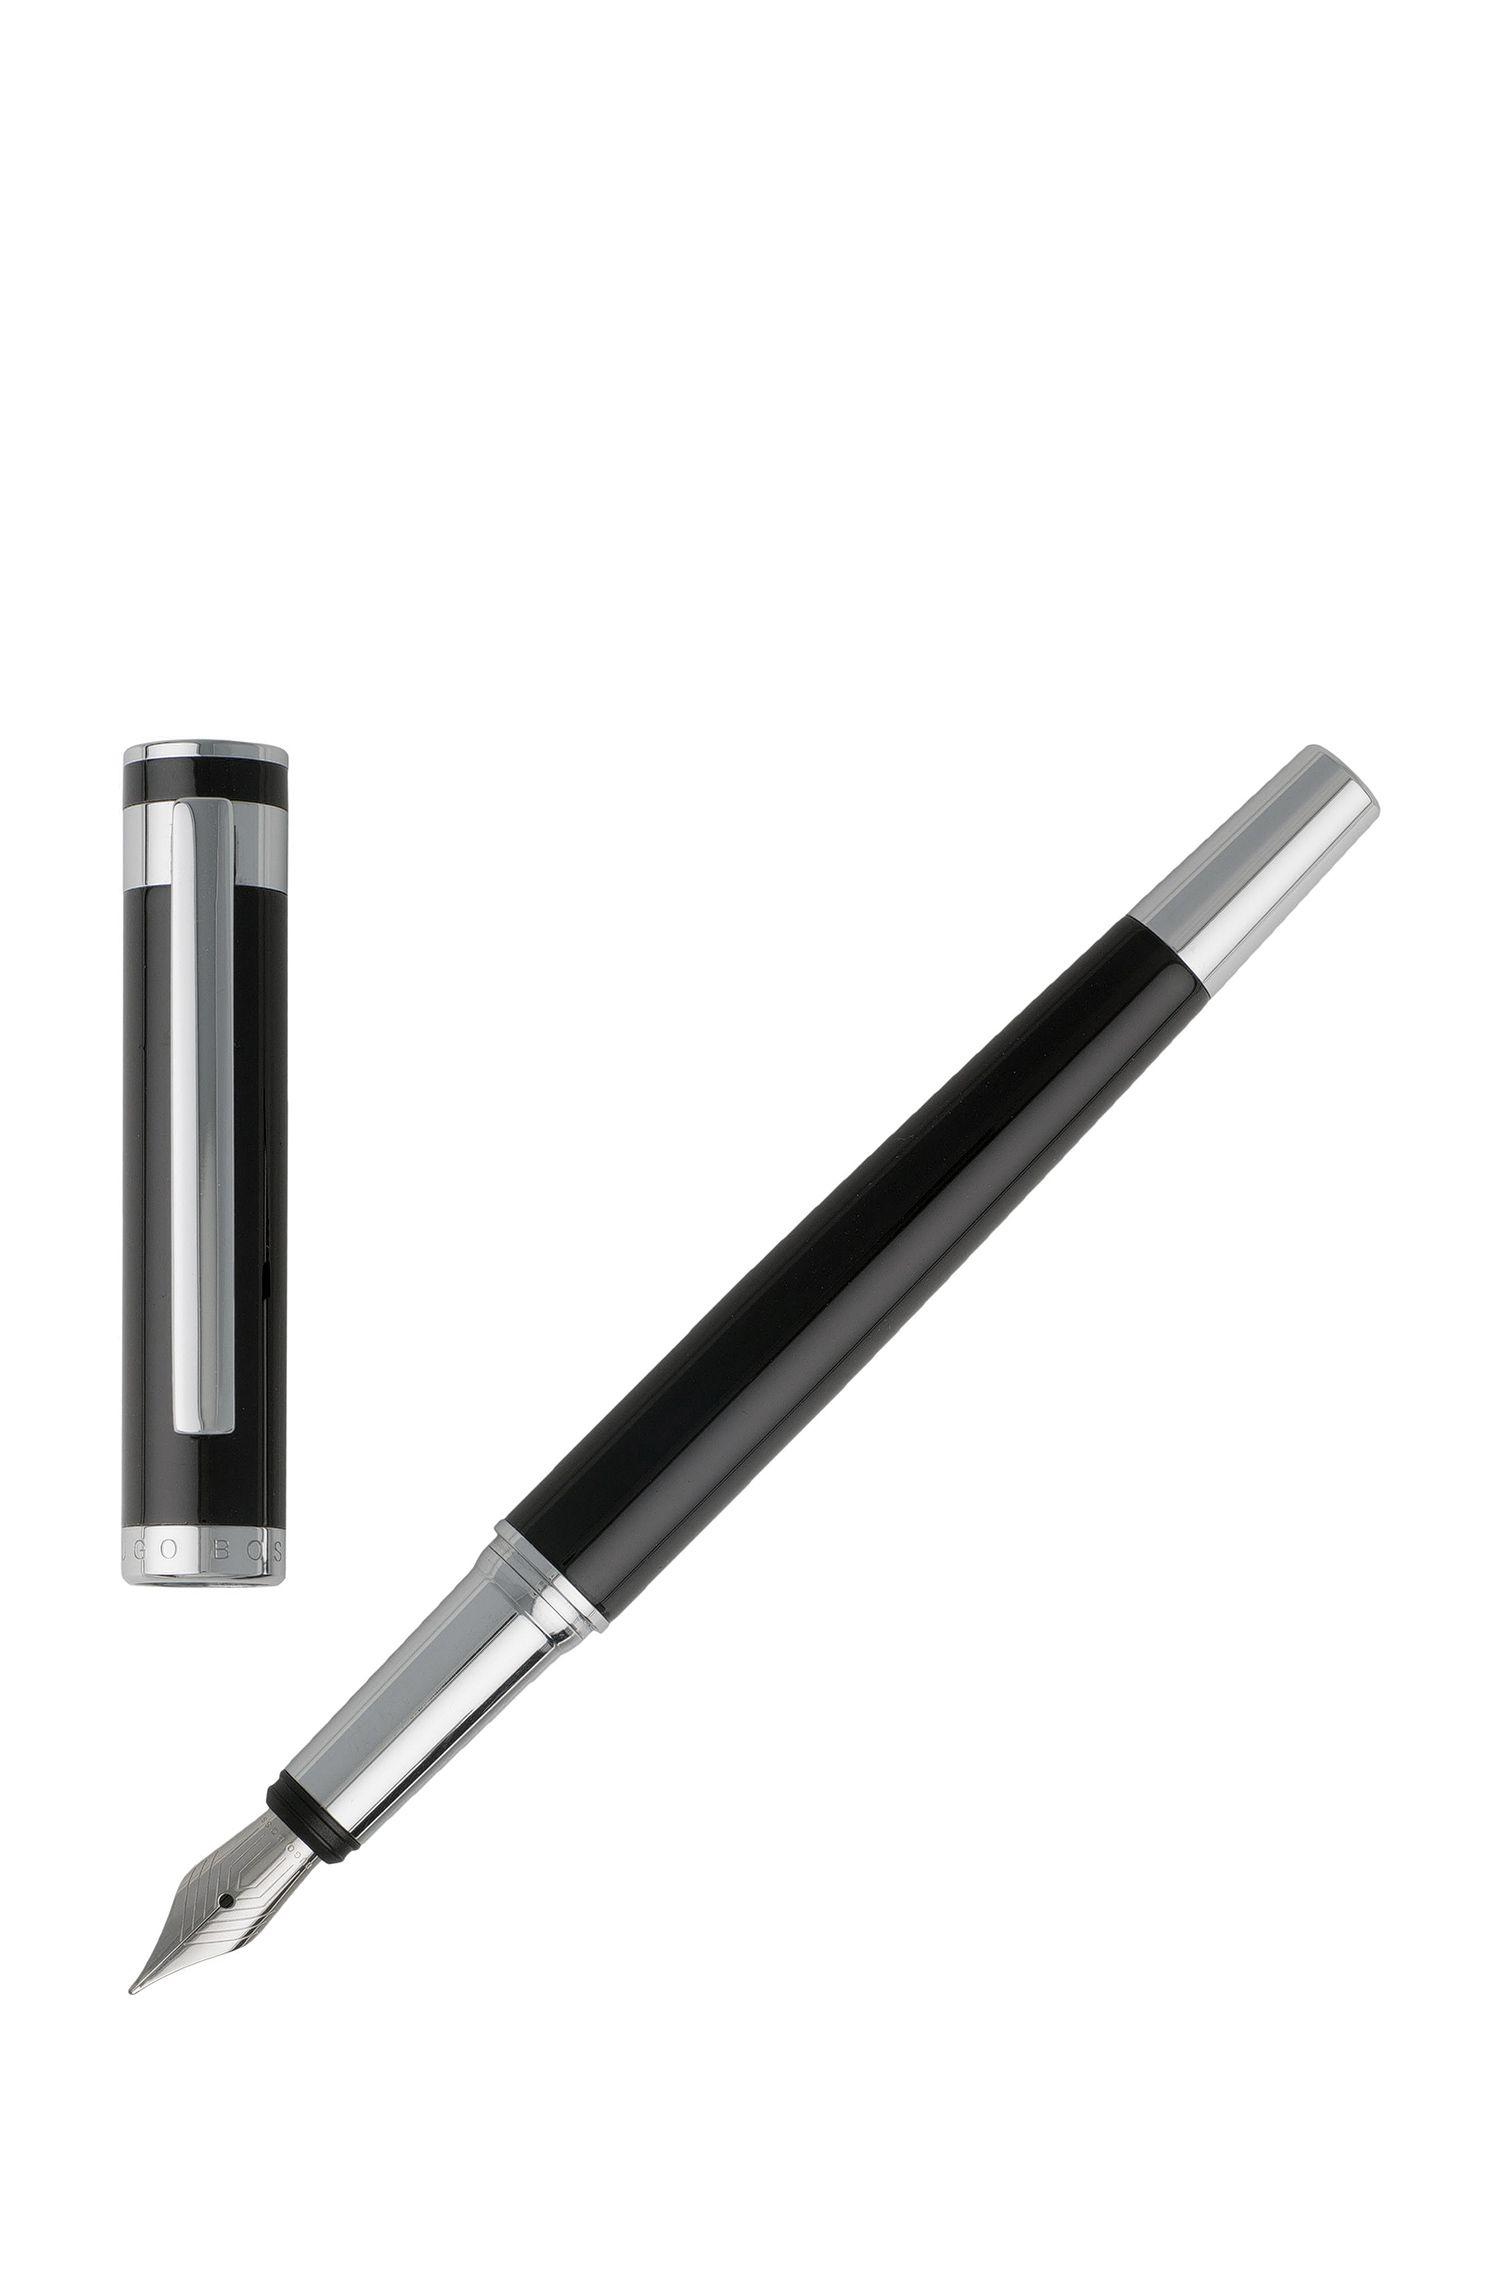 Fountain pen in glossy black lacquer